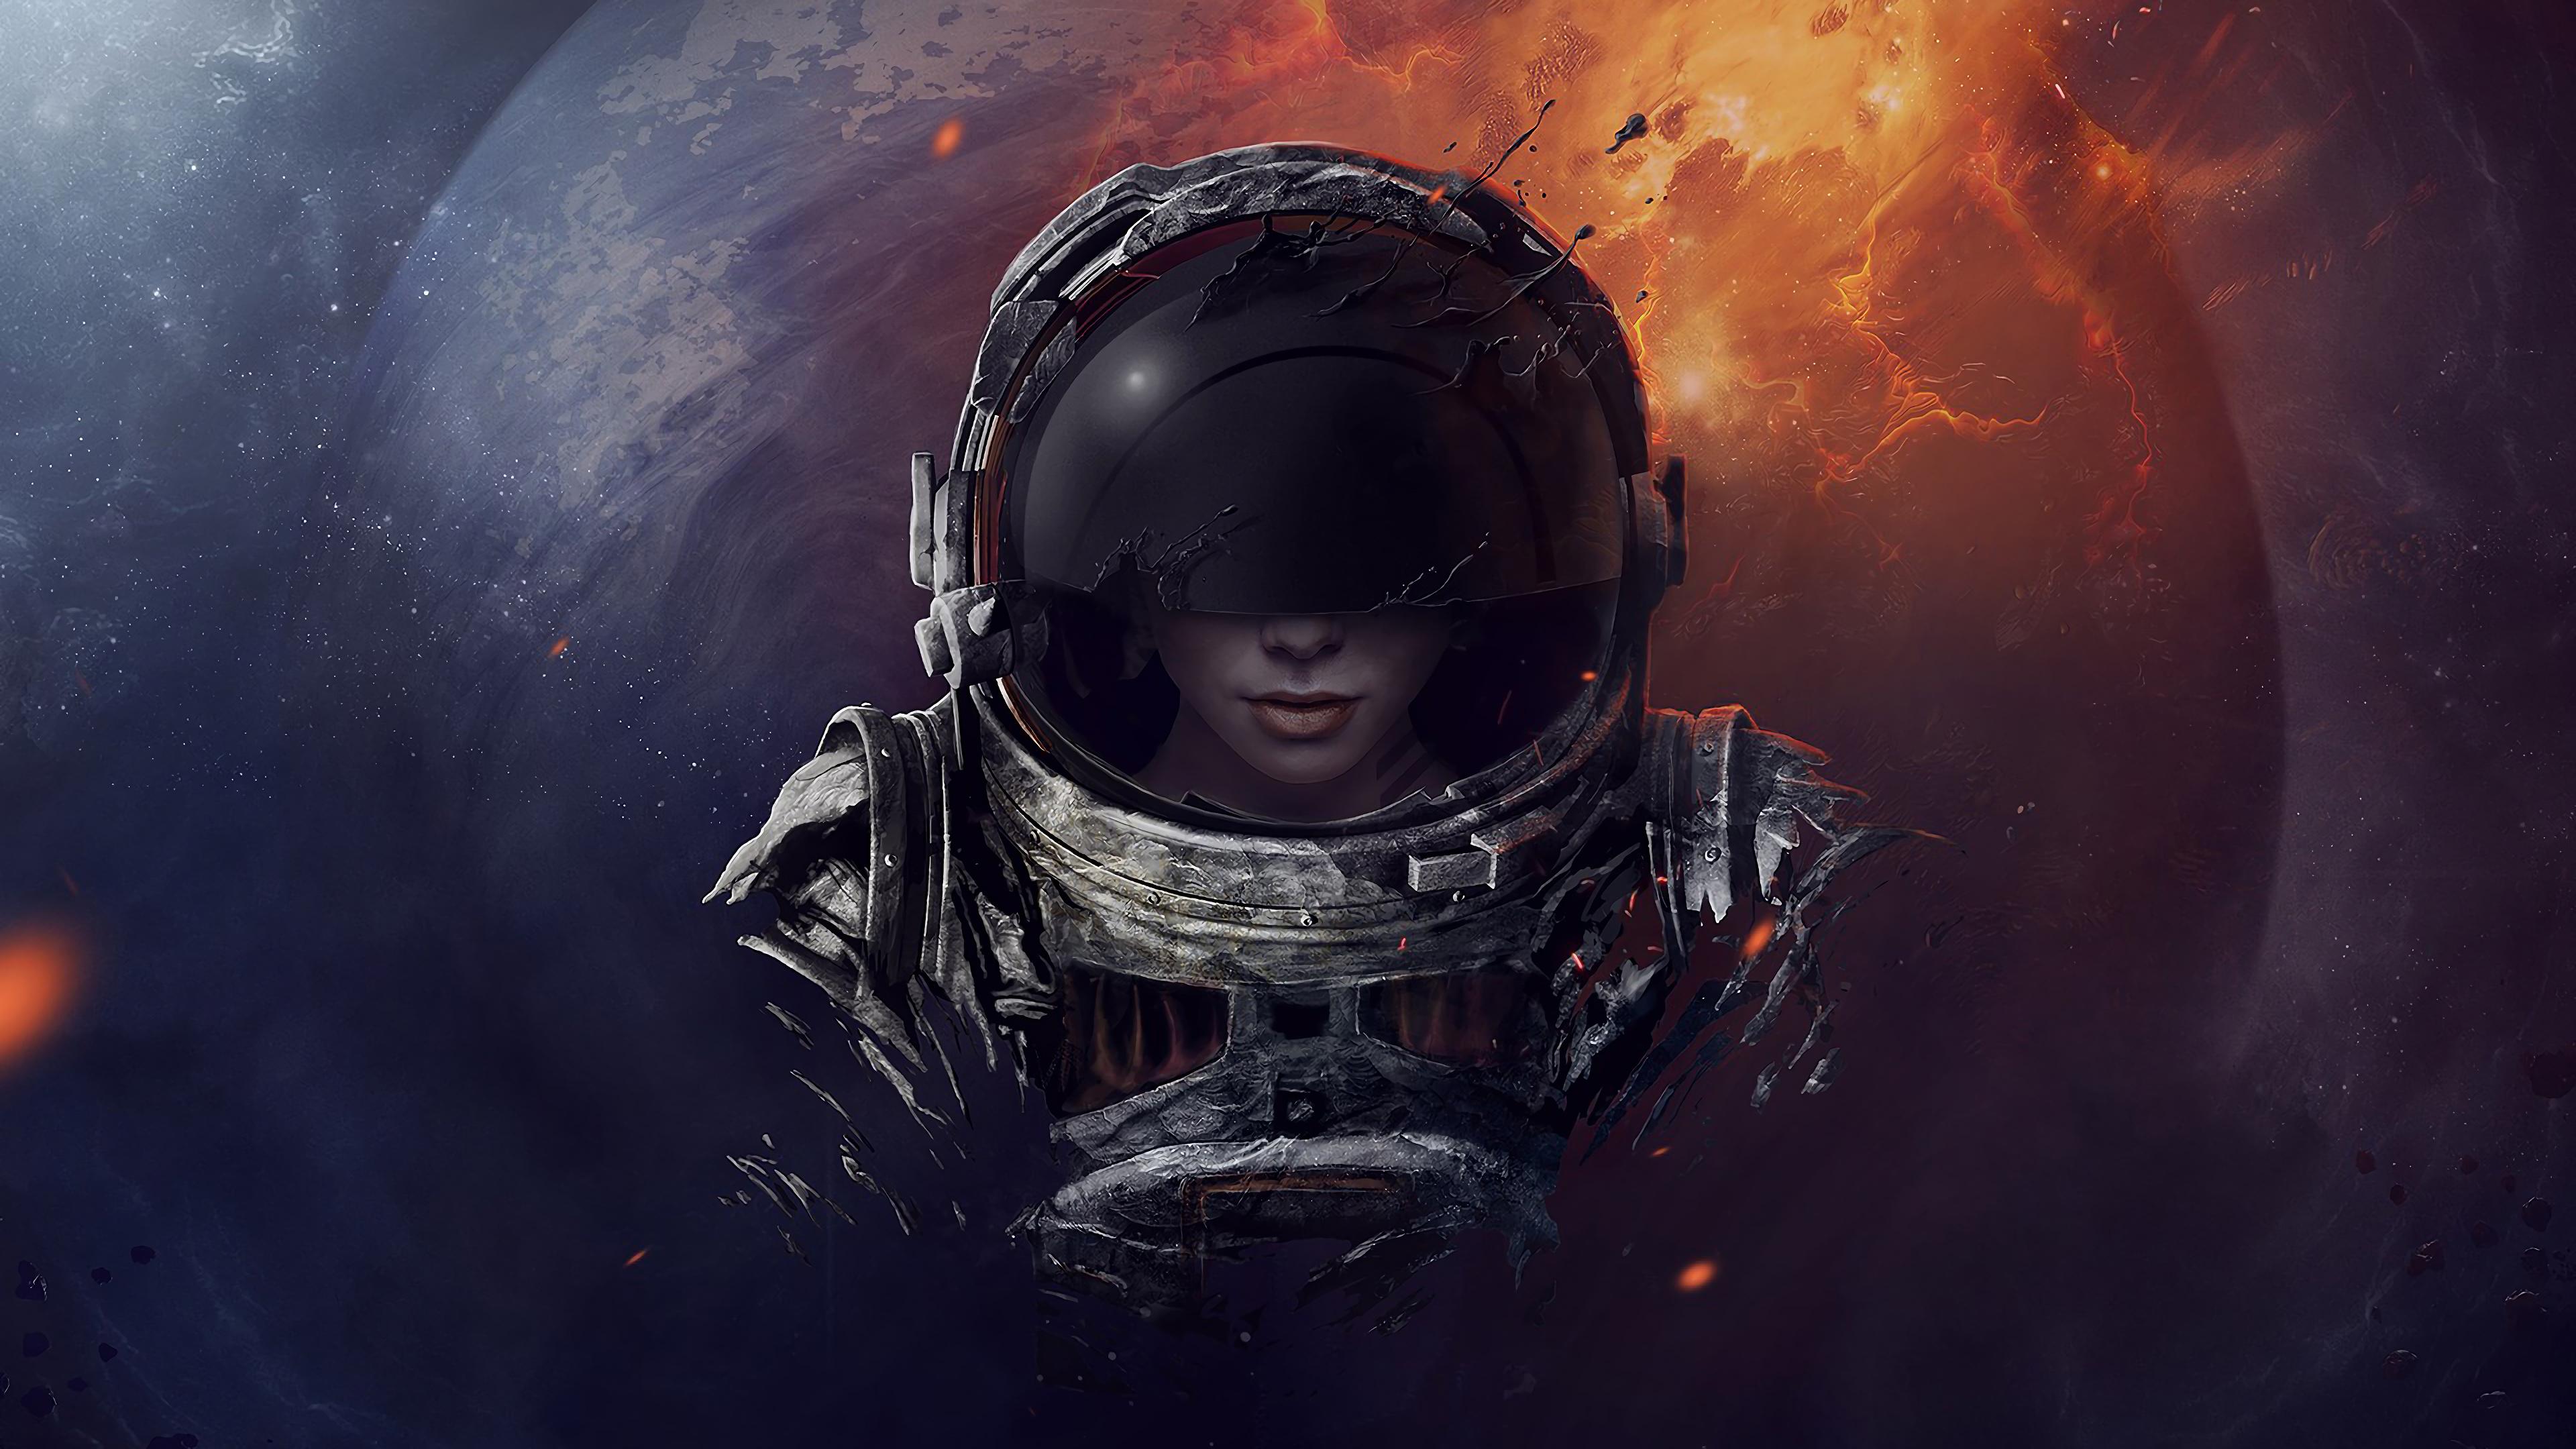 Sci Fi Astronaut Digital Art 4k Wallpaper 156